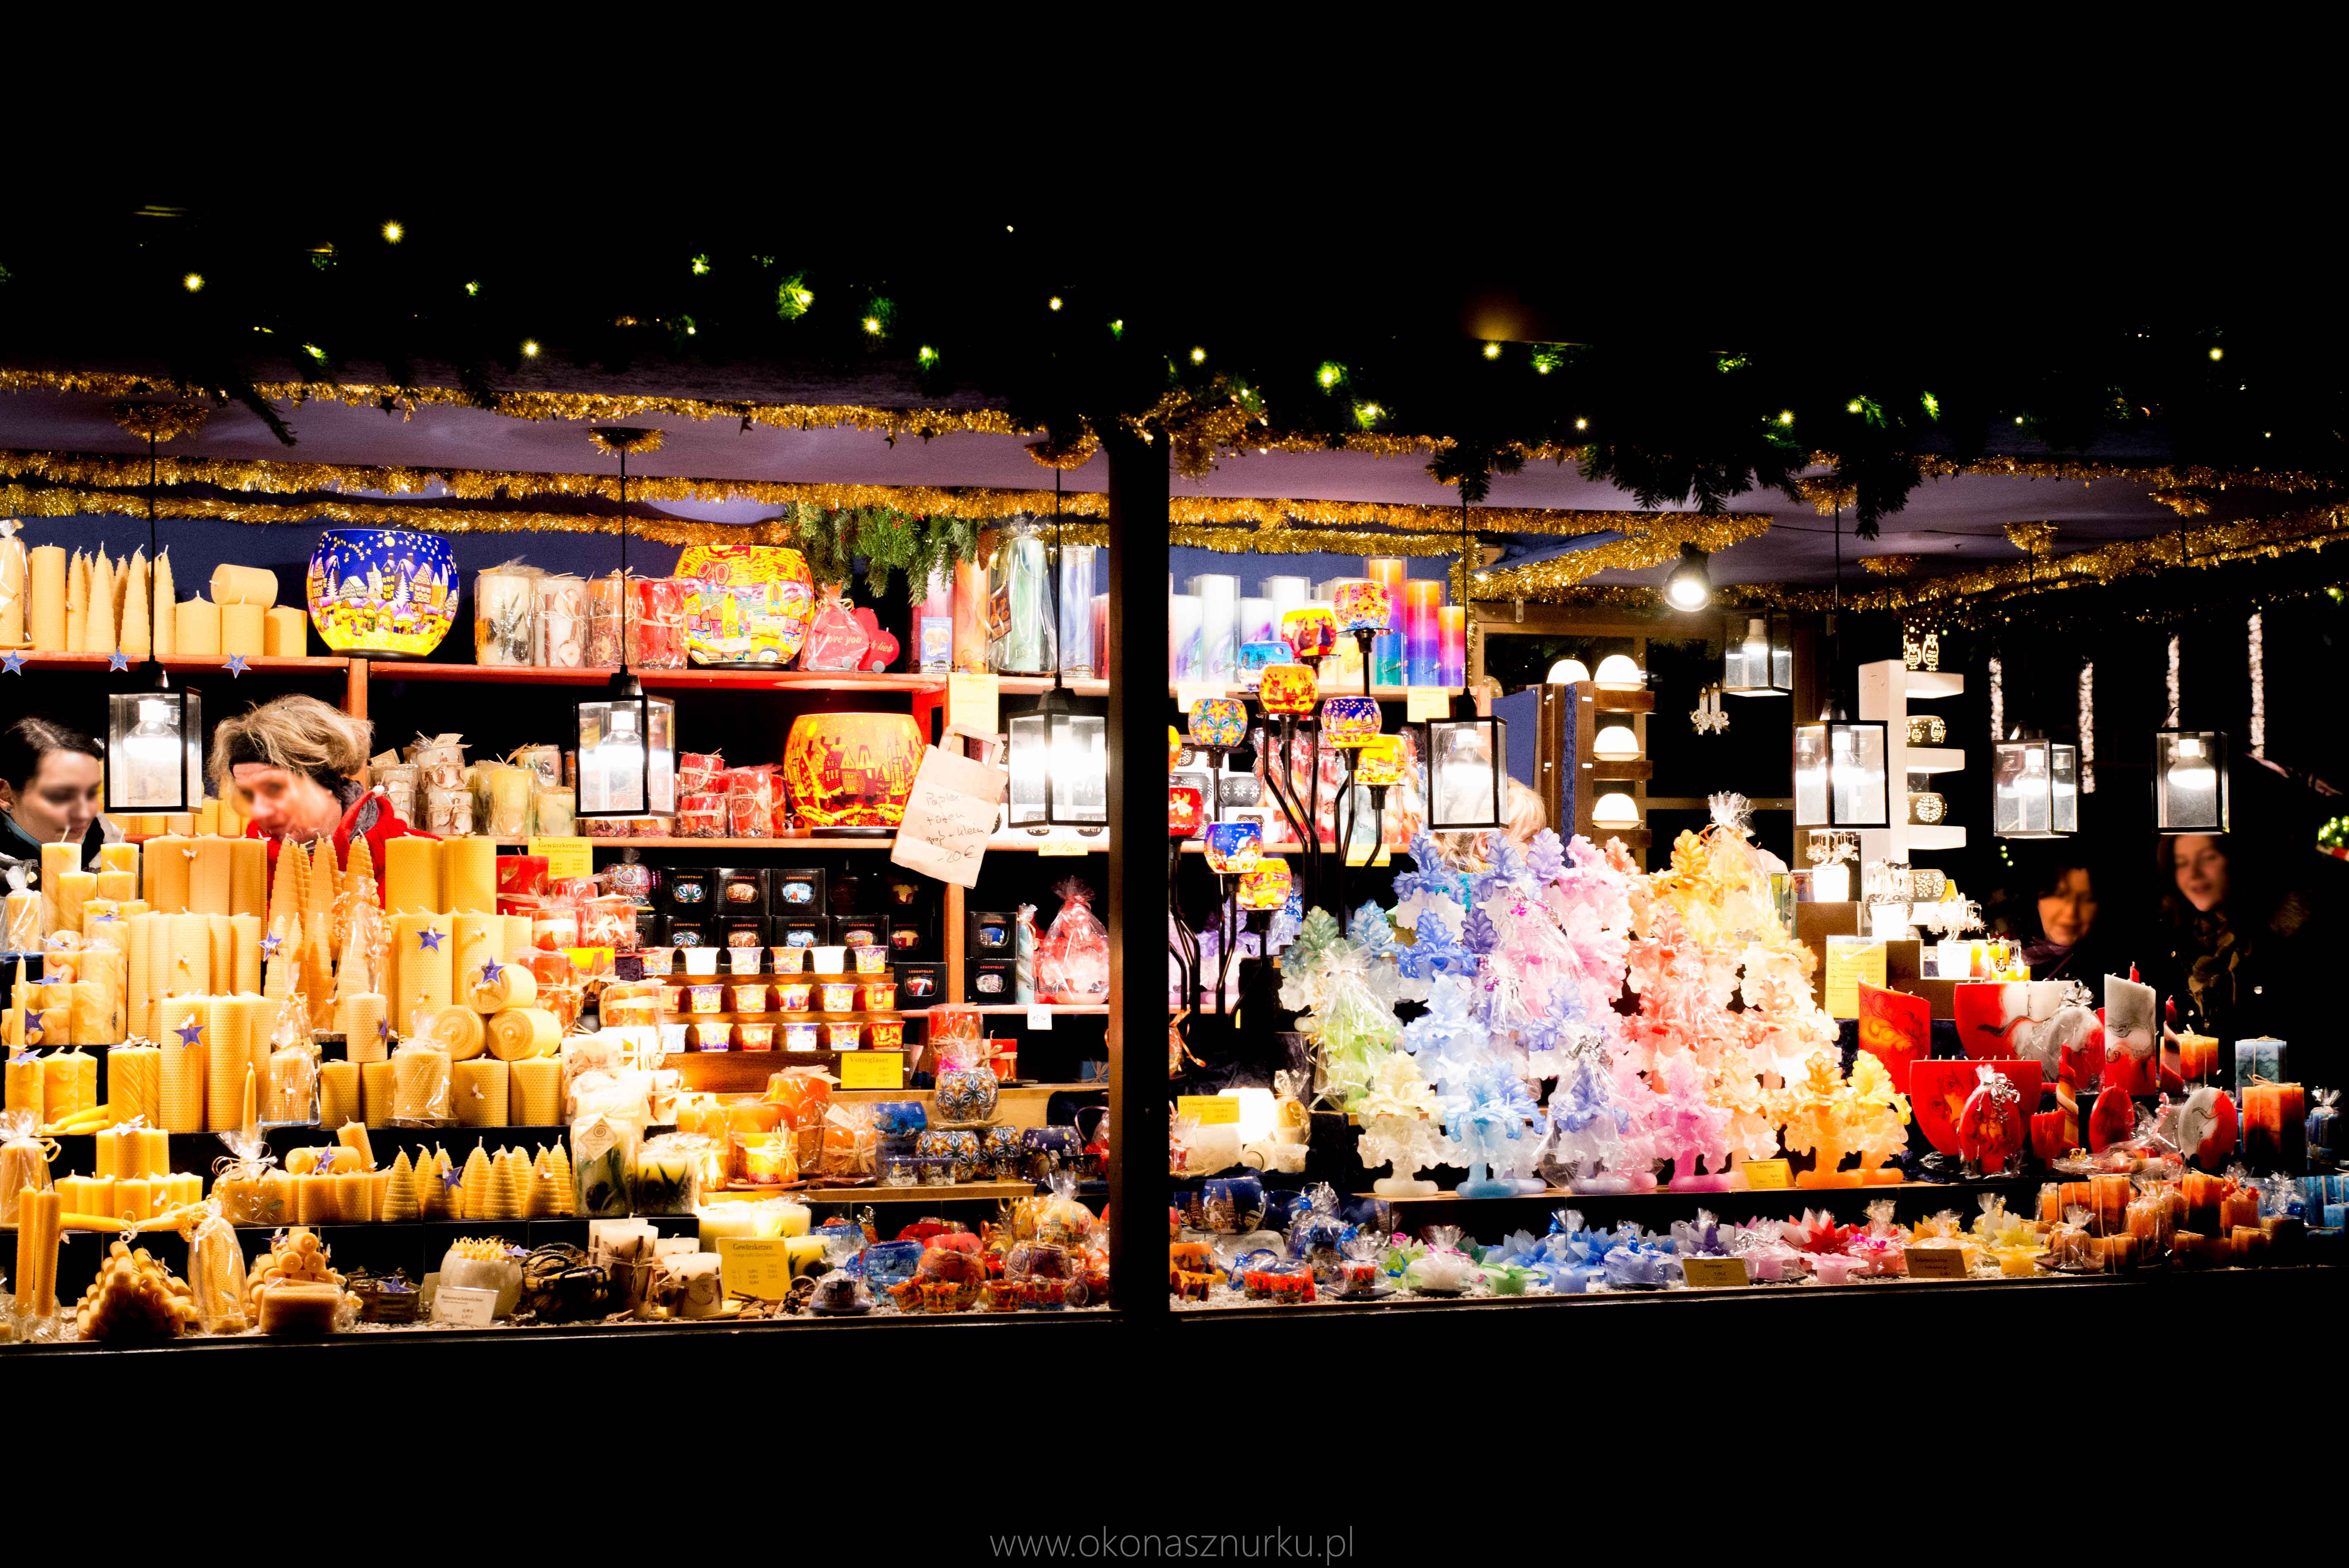 norymberga-weihnachtsmarkt-christmas-market-nurnberg (23)